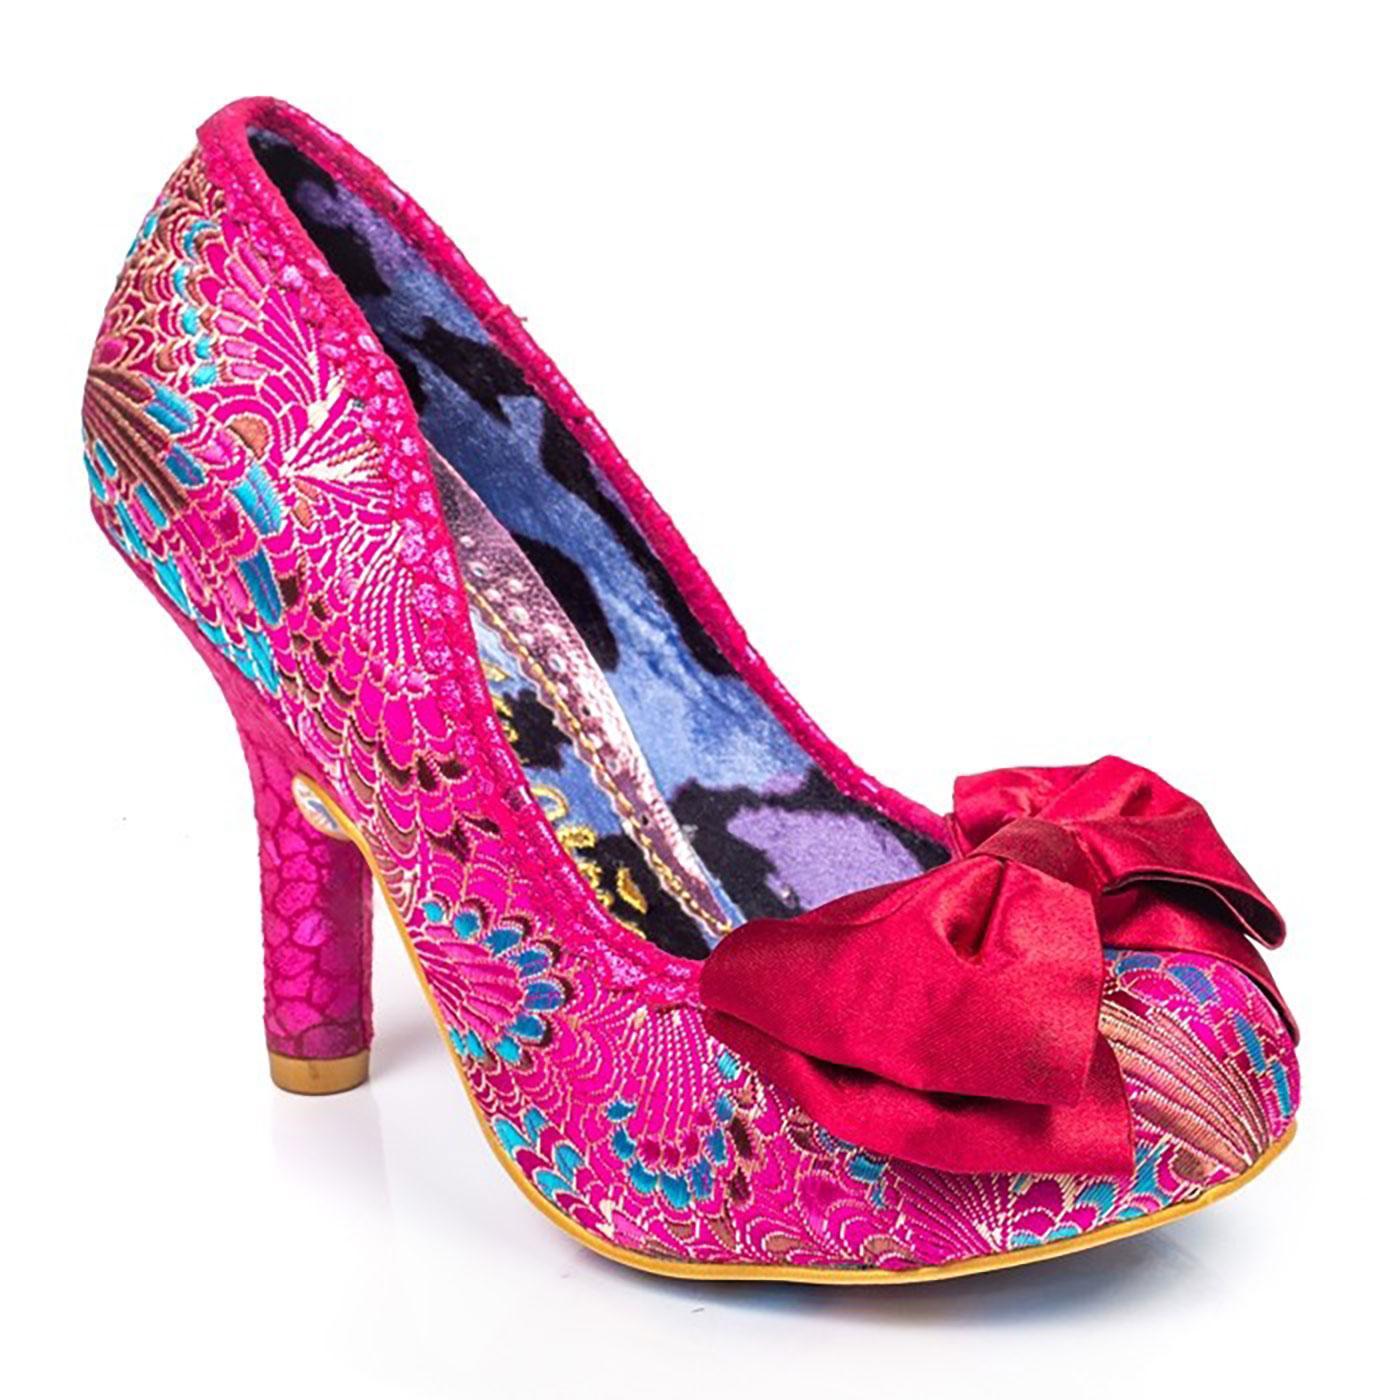 Mal E Bow IRREGULAR CHOICE Embroidered Heels PINK